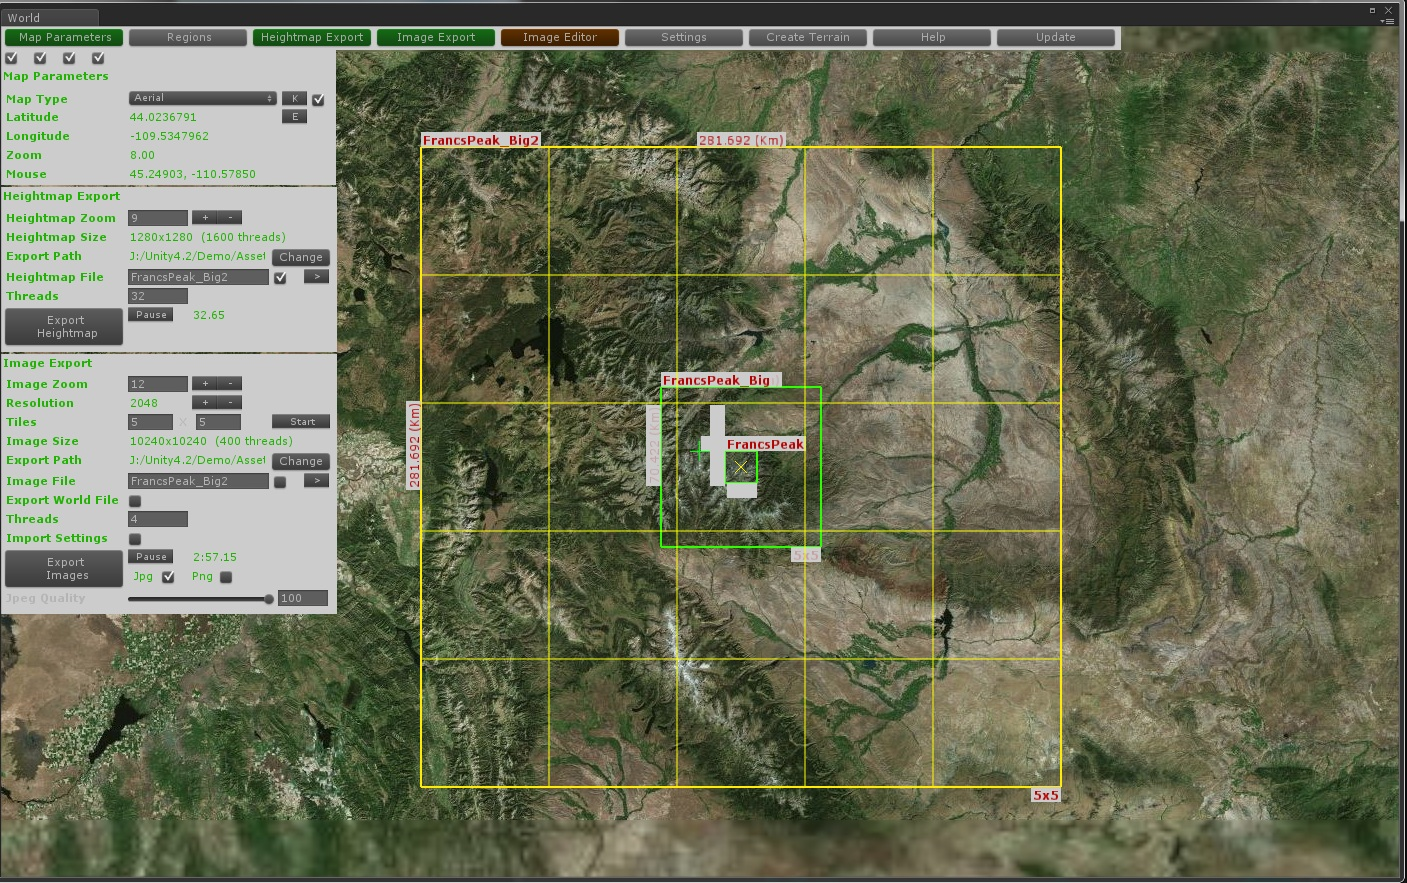 $terrain3.jpg